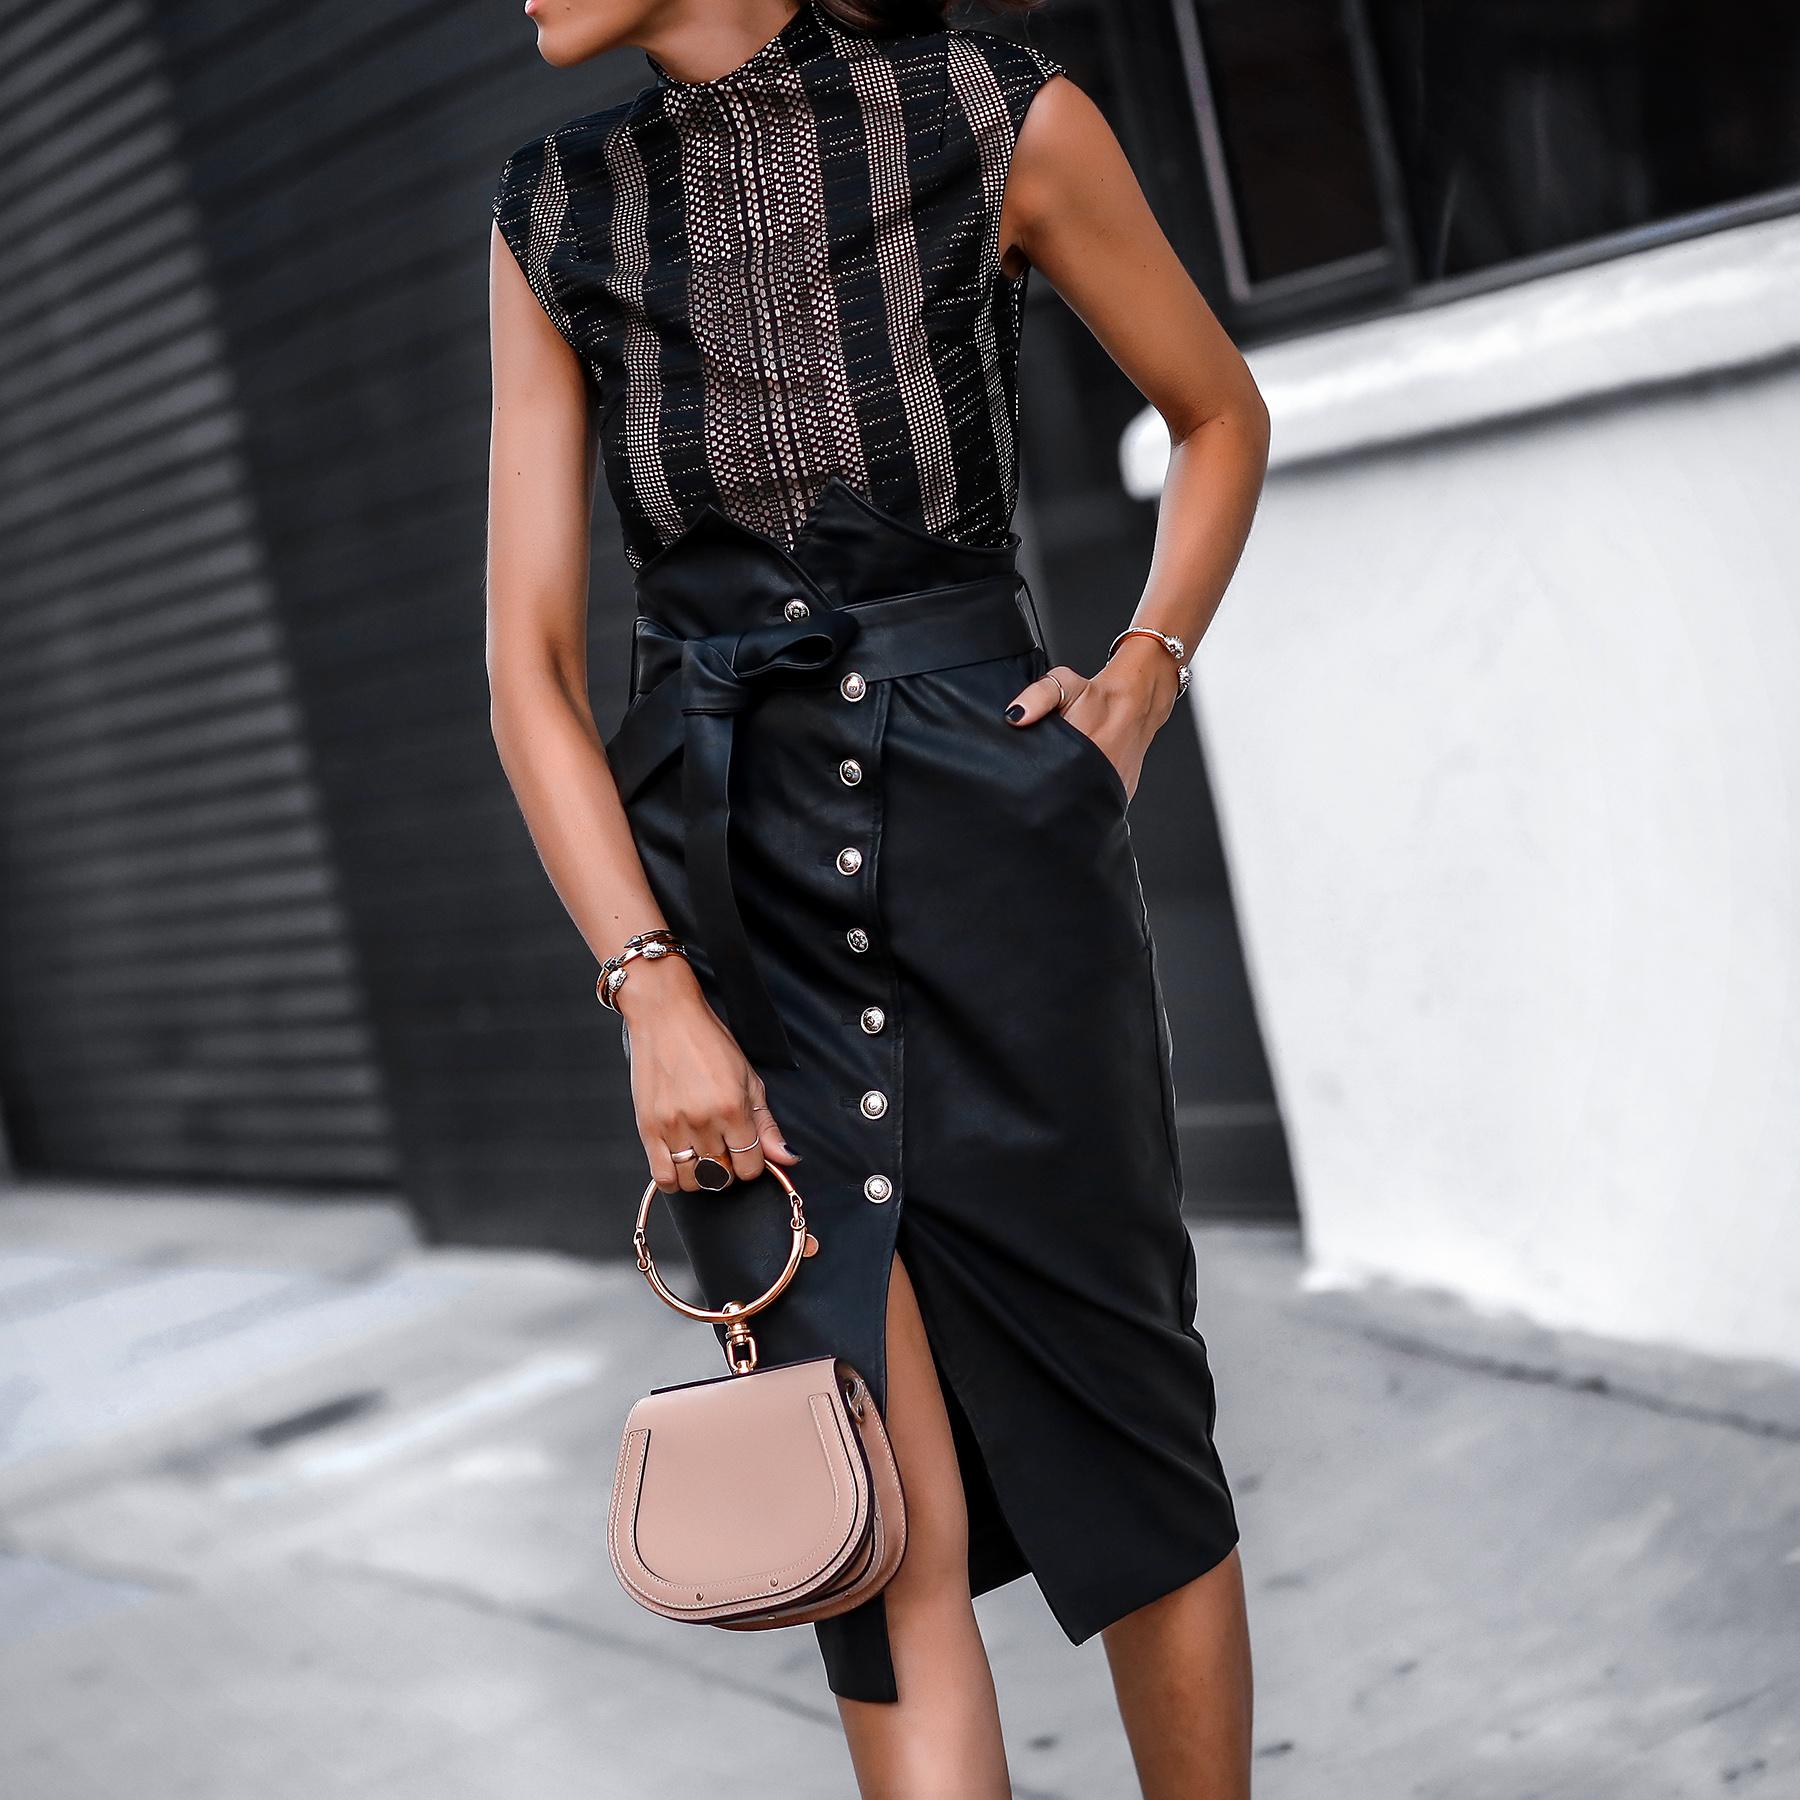 Misha Collection Bodysuit Bardot Faux Leather Wrap Skirt Chloe Nile Bag.jpg